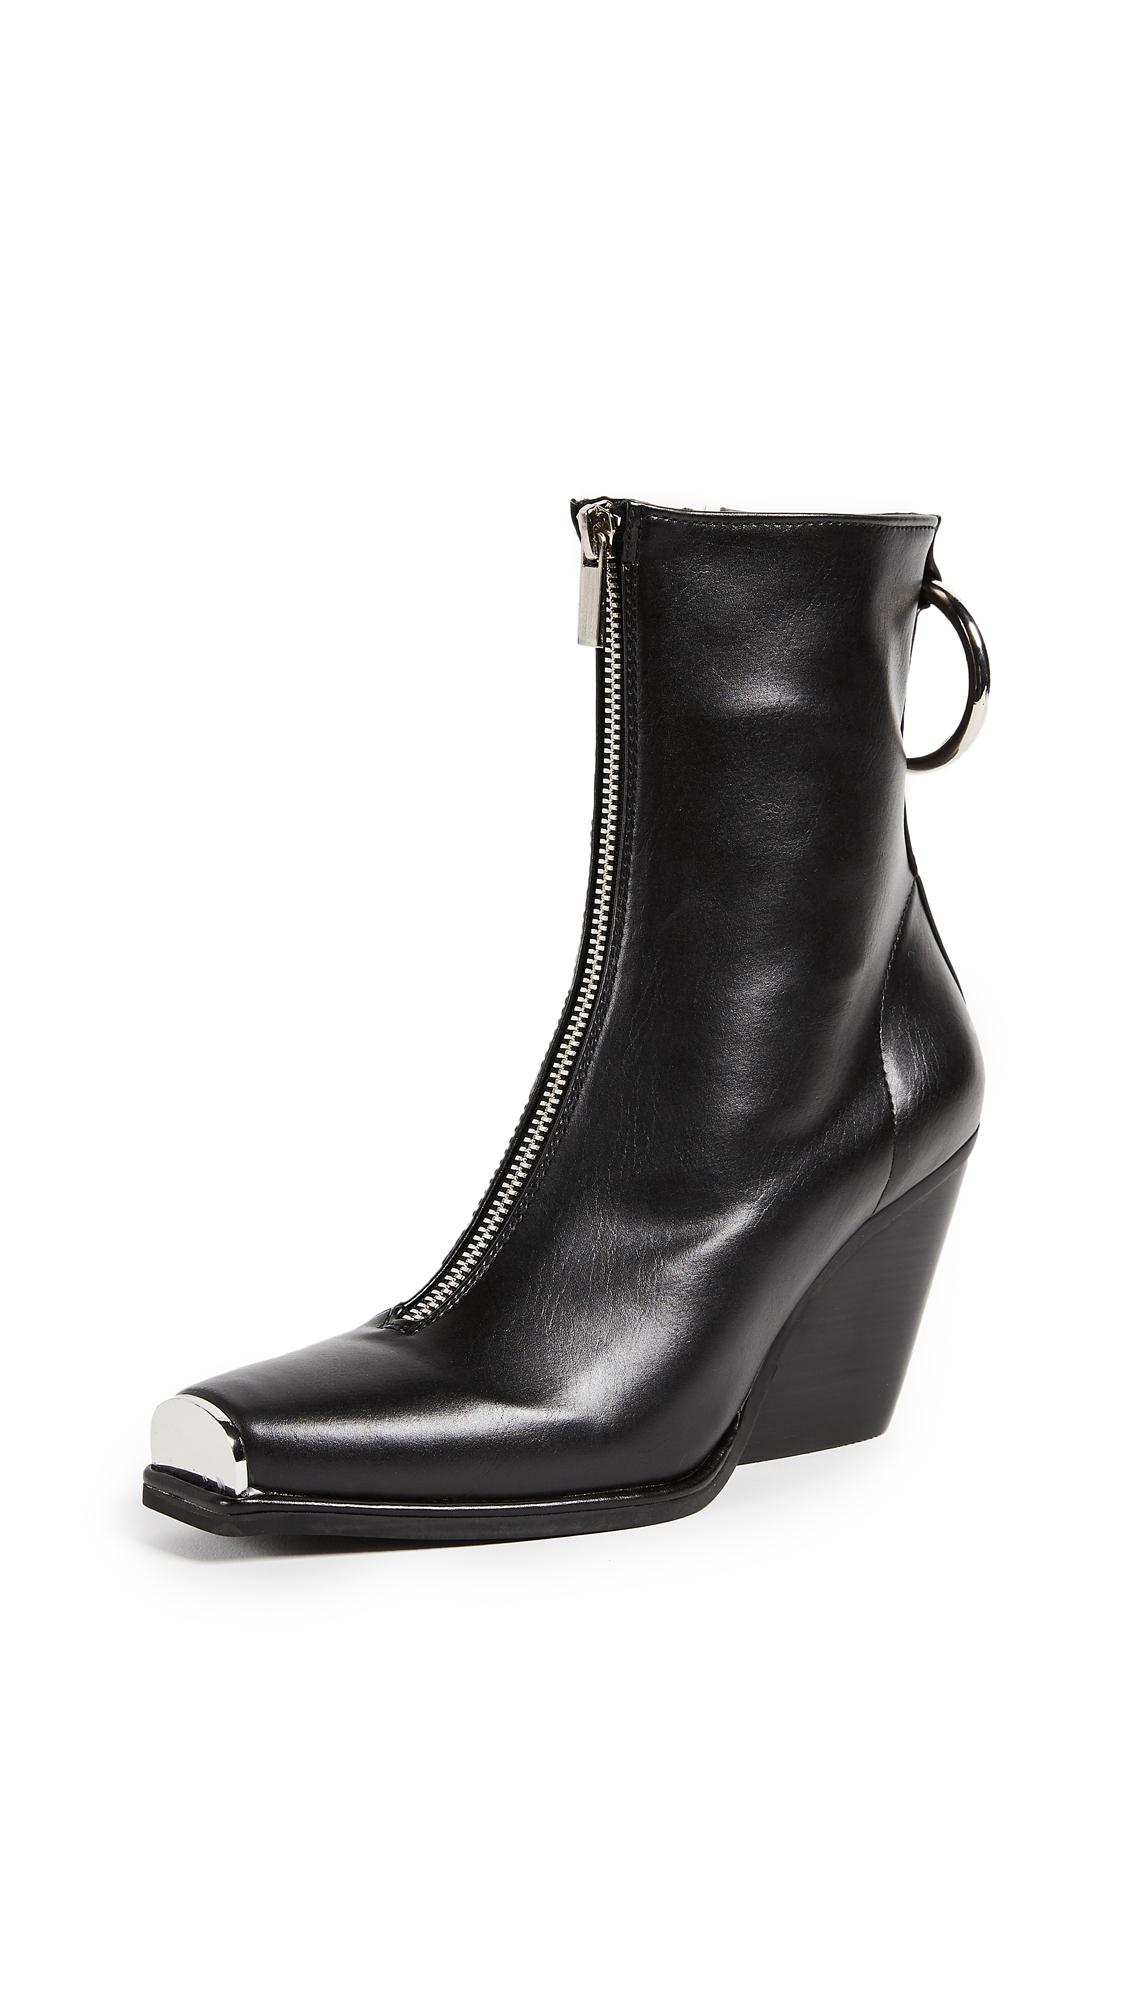 Jeffrey Campbell Welton Block Heel Boots - Black Silver